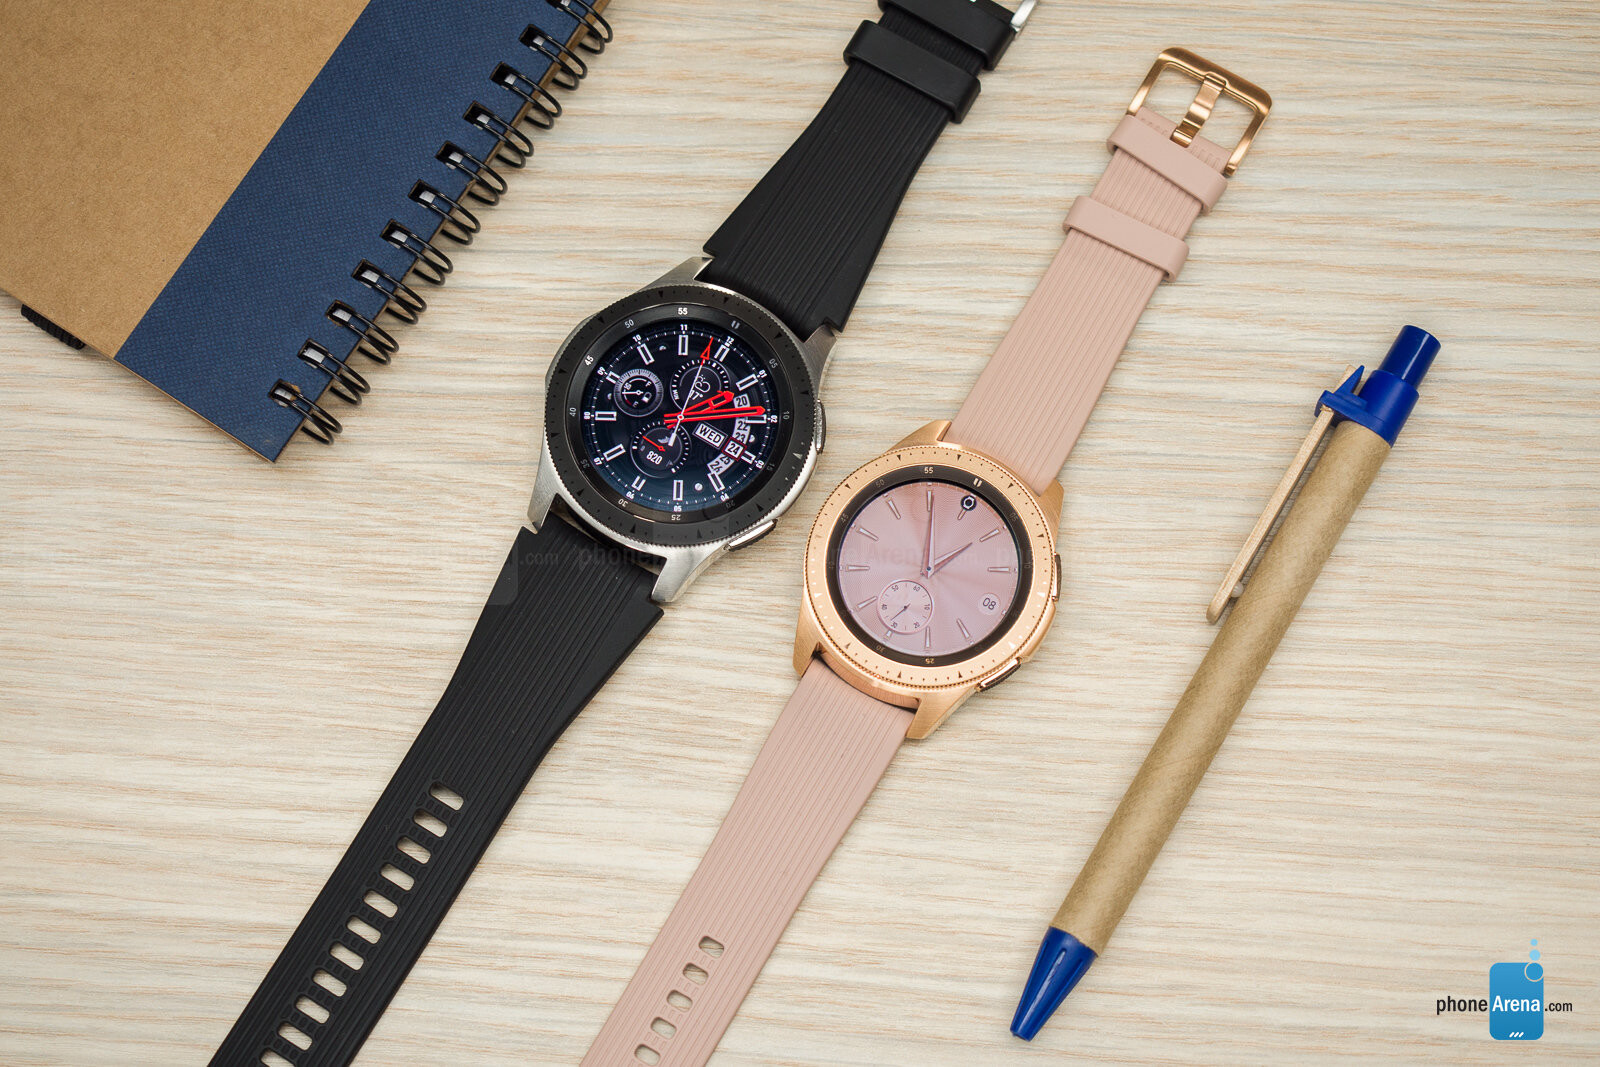 Samsung Galaxy Watch Review - PhoneArena